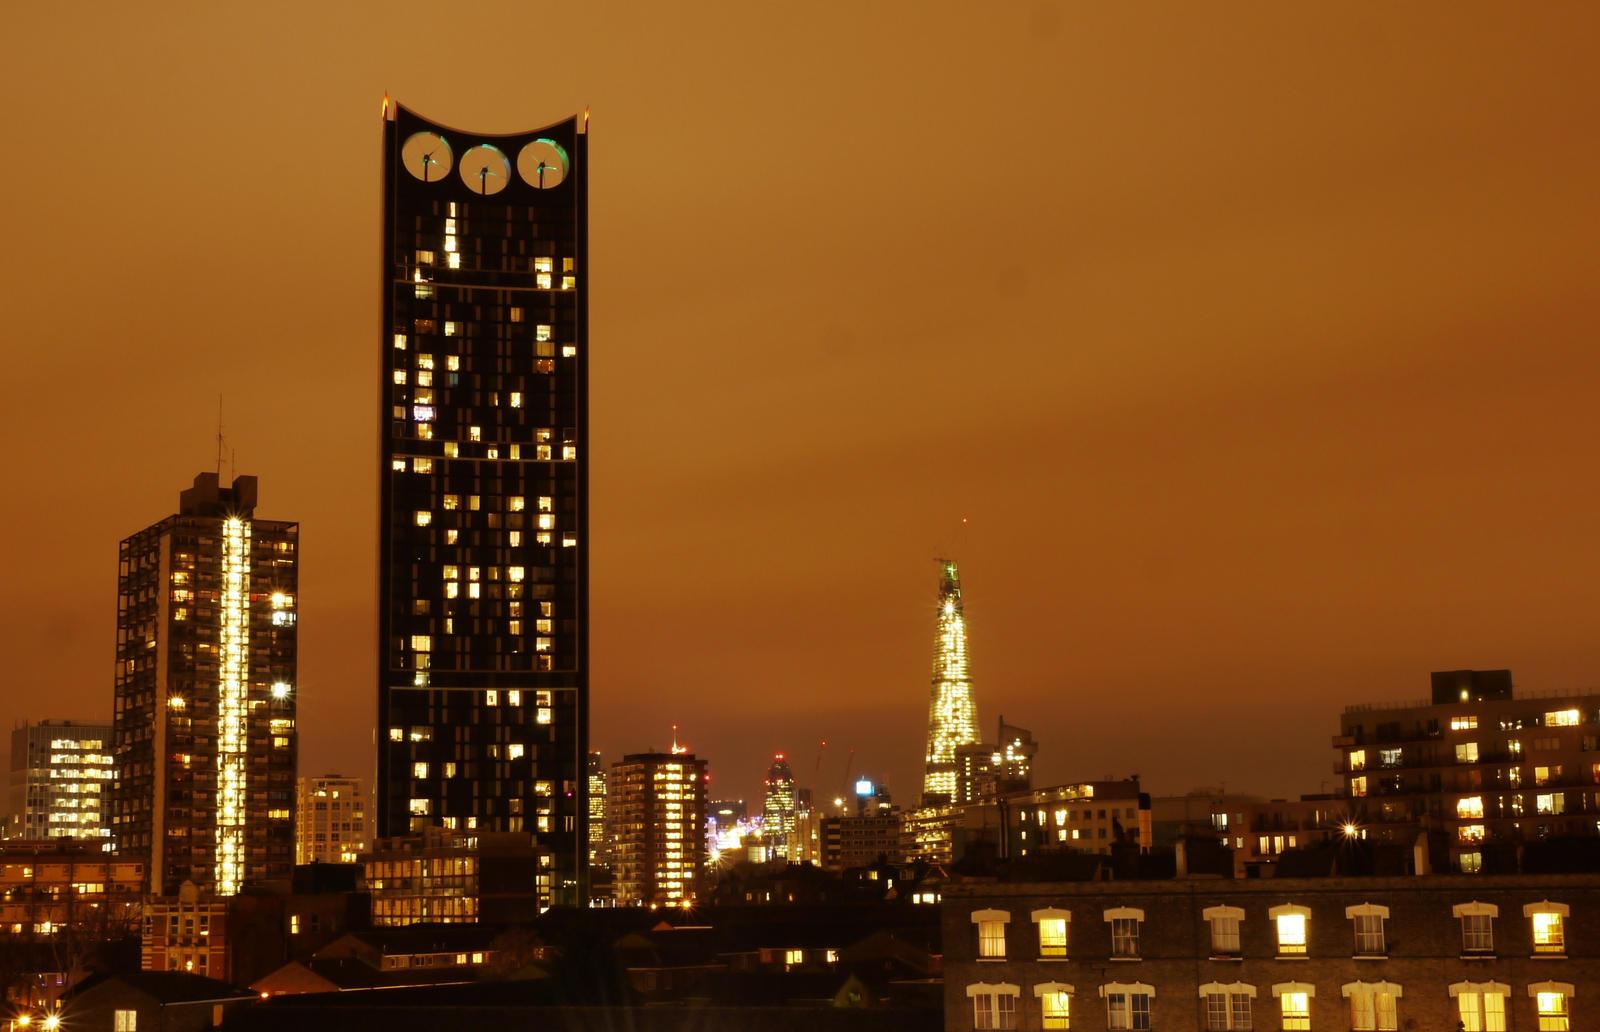 Southwick by night by RoB-FranKsDad